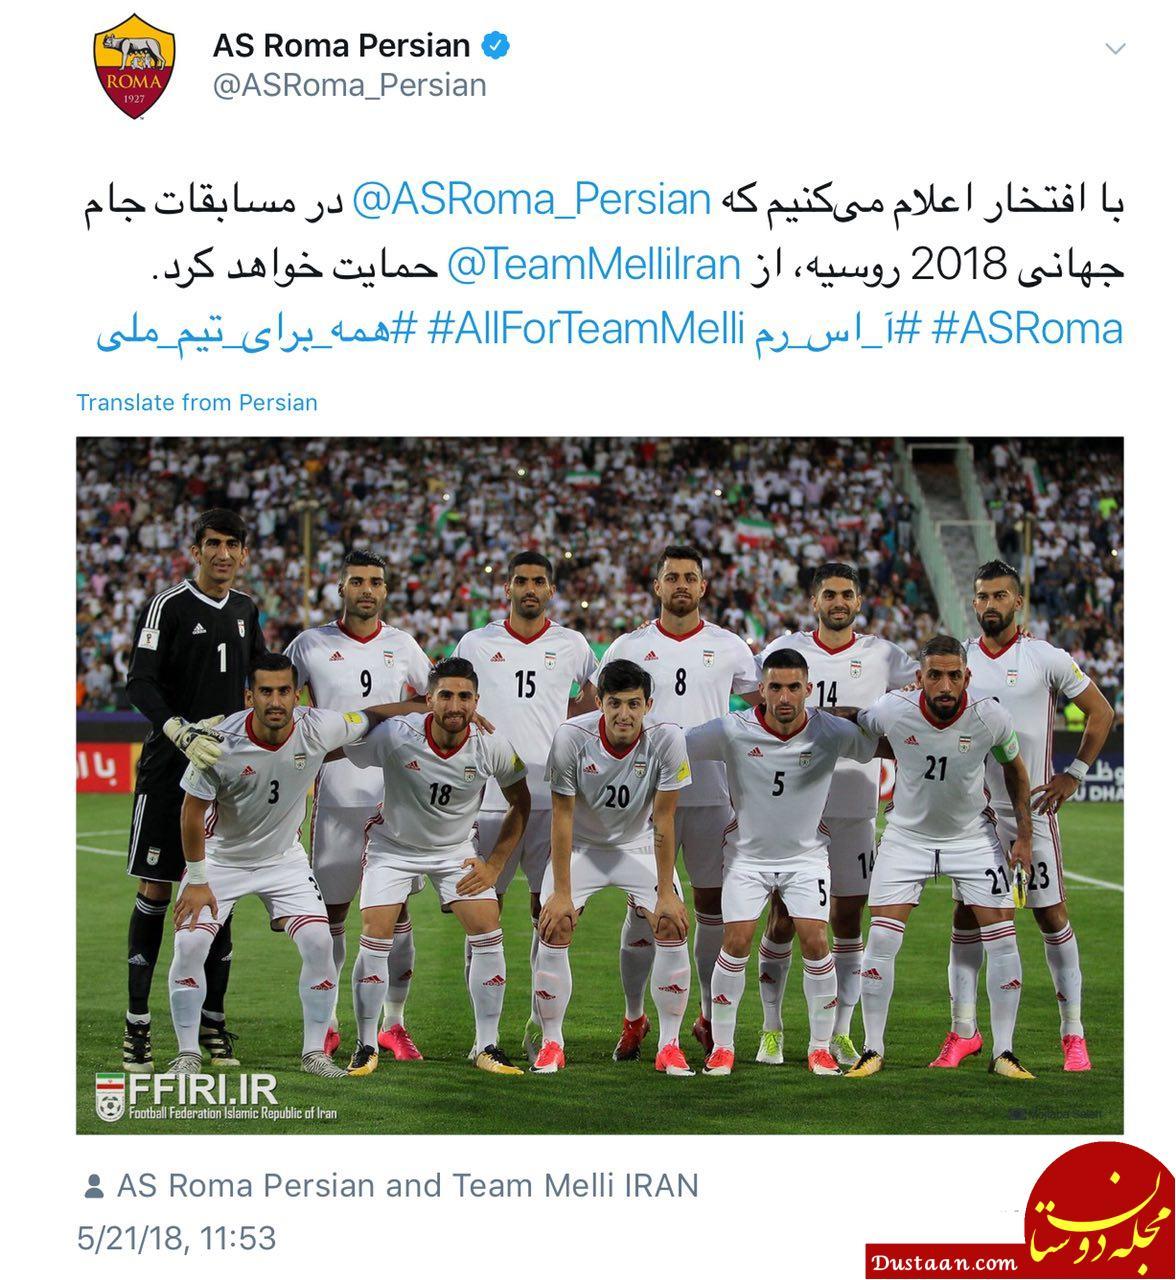 www.dustaan.com حمایت آاس رم از تیم ملی ایران در جام جهانی 2018